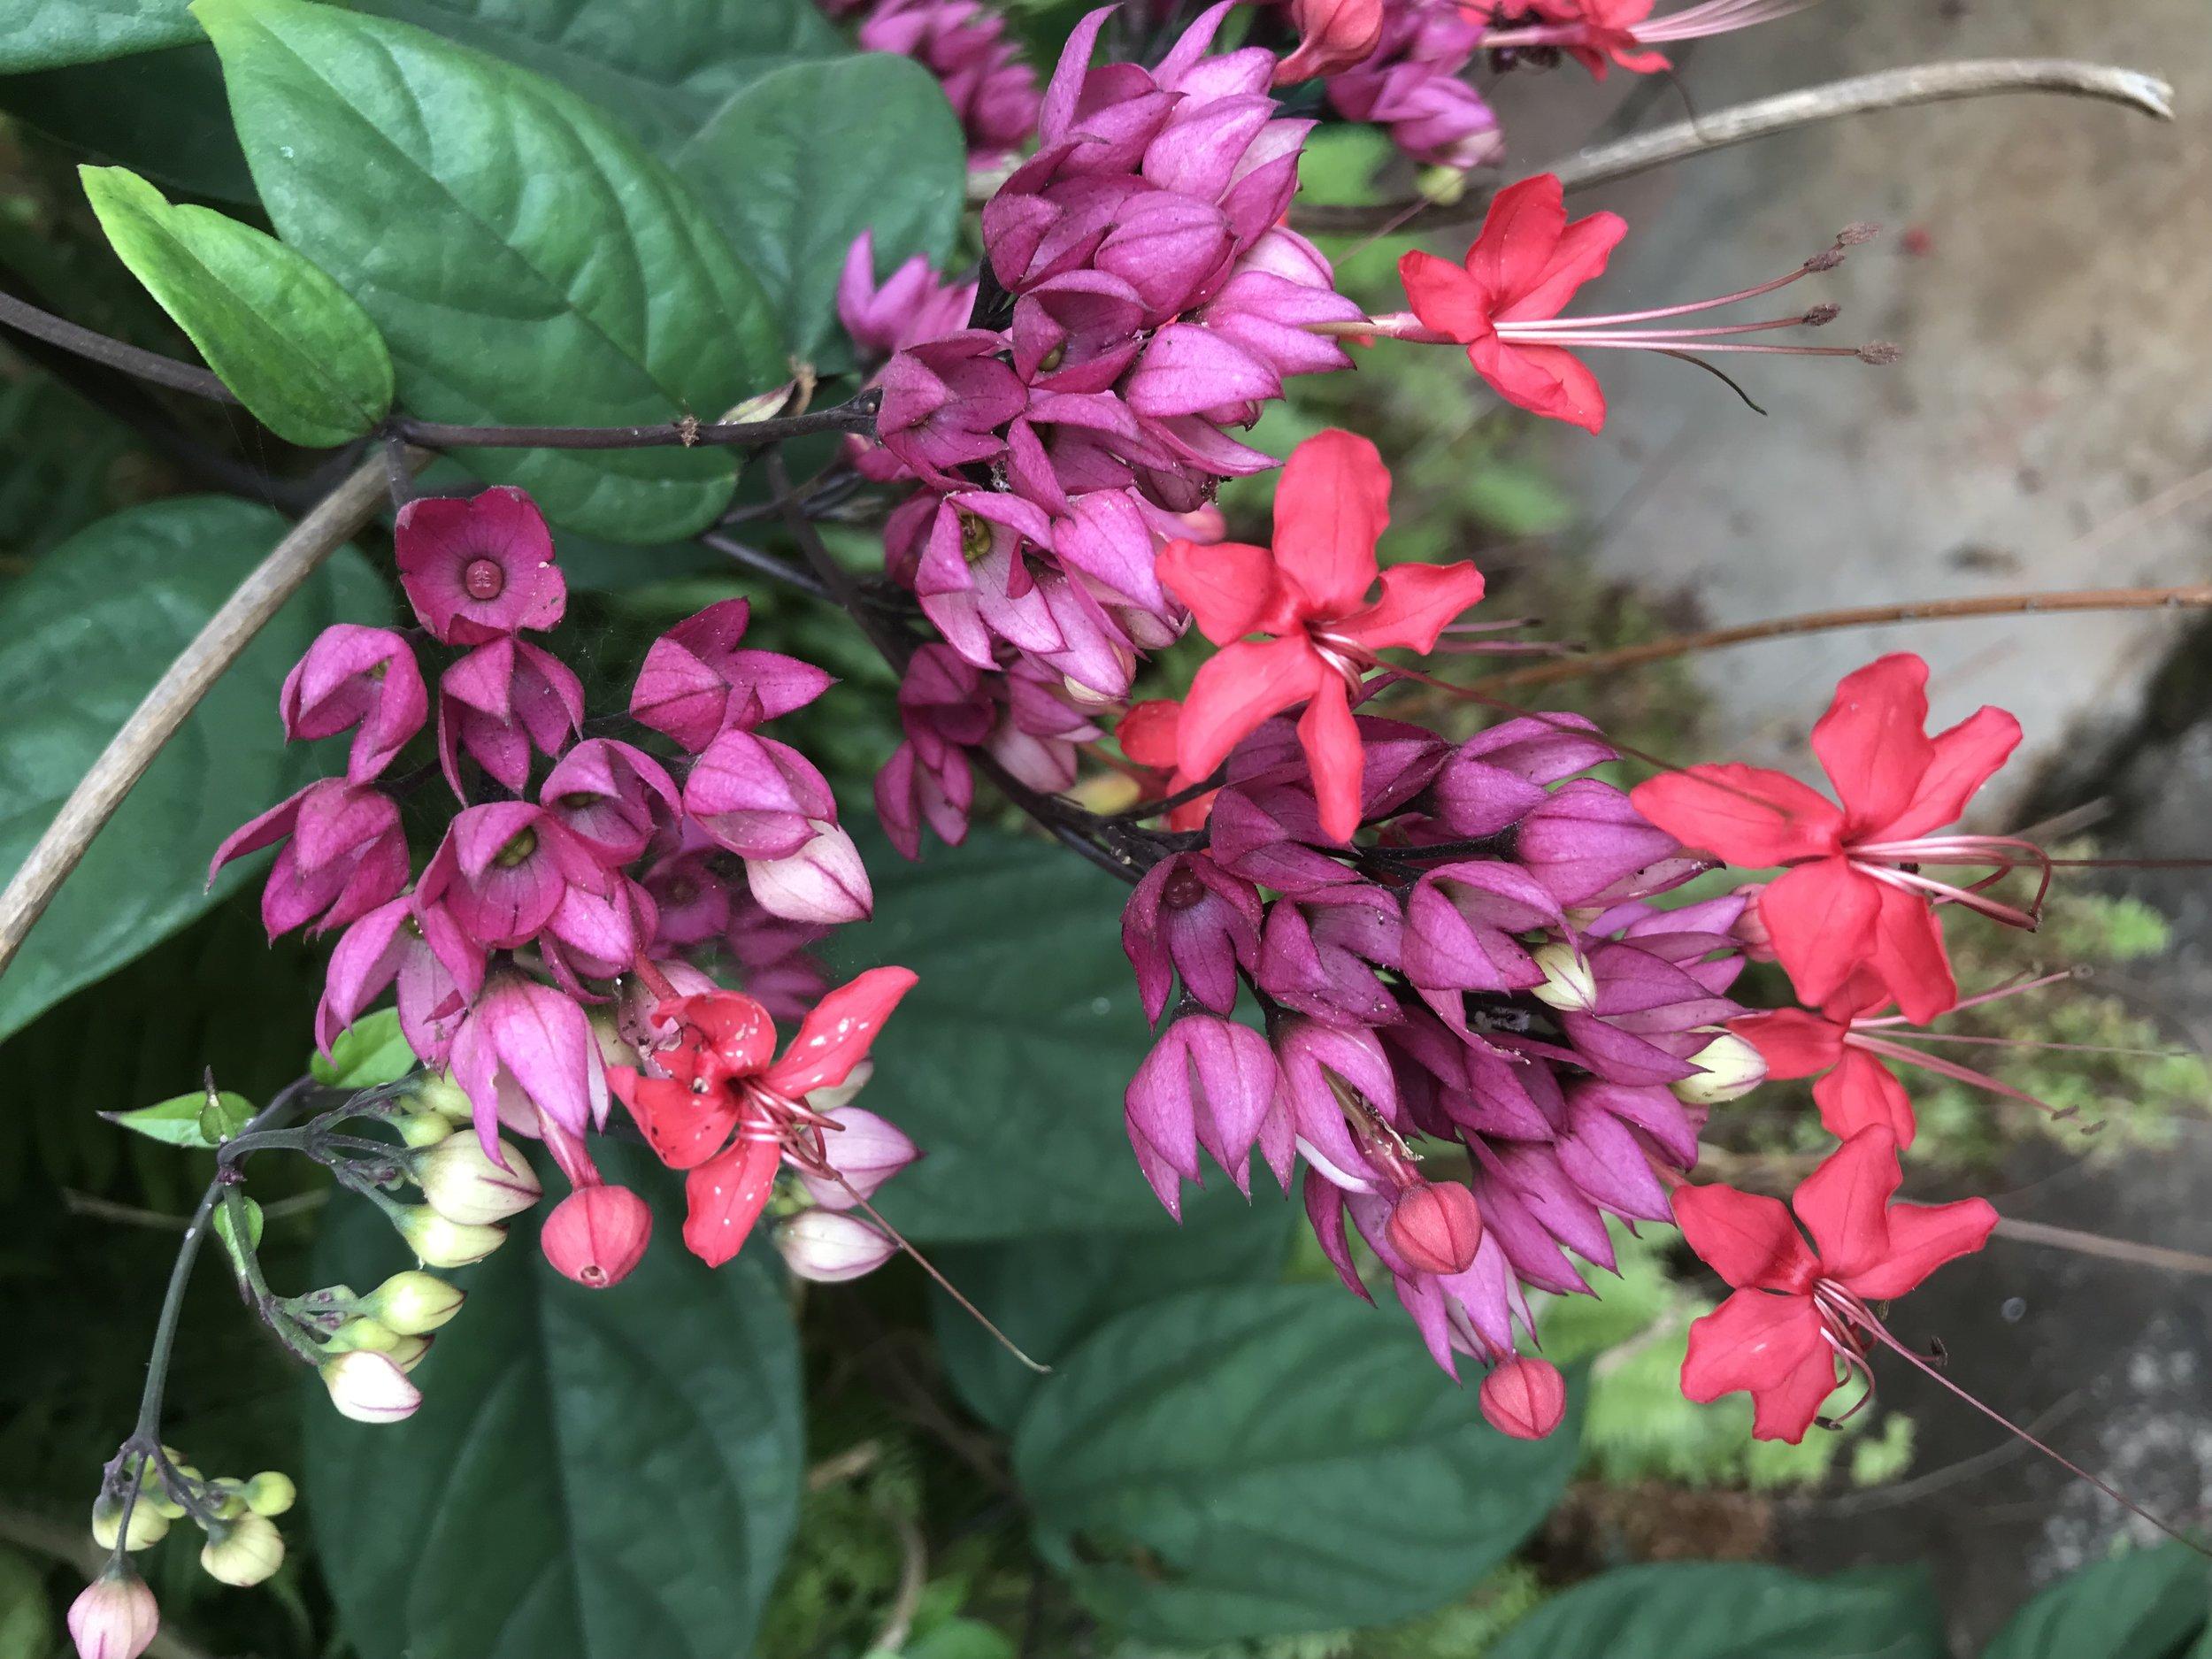 Rainforest flowers